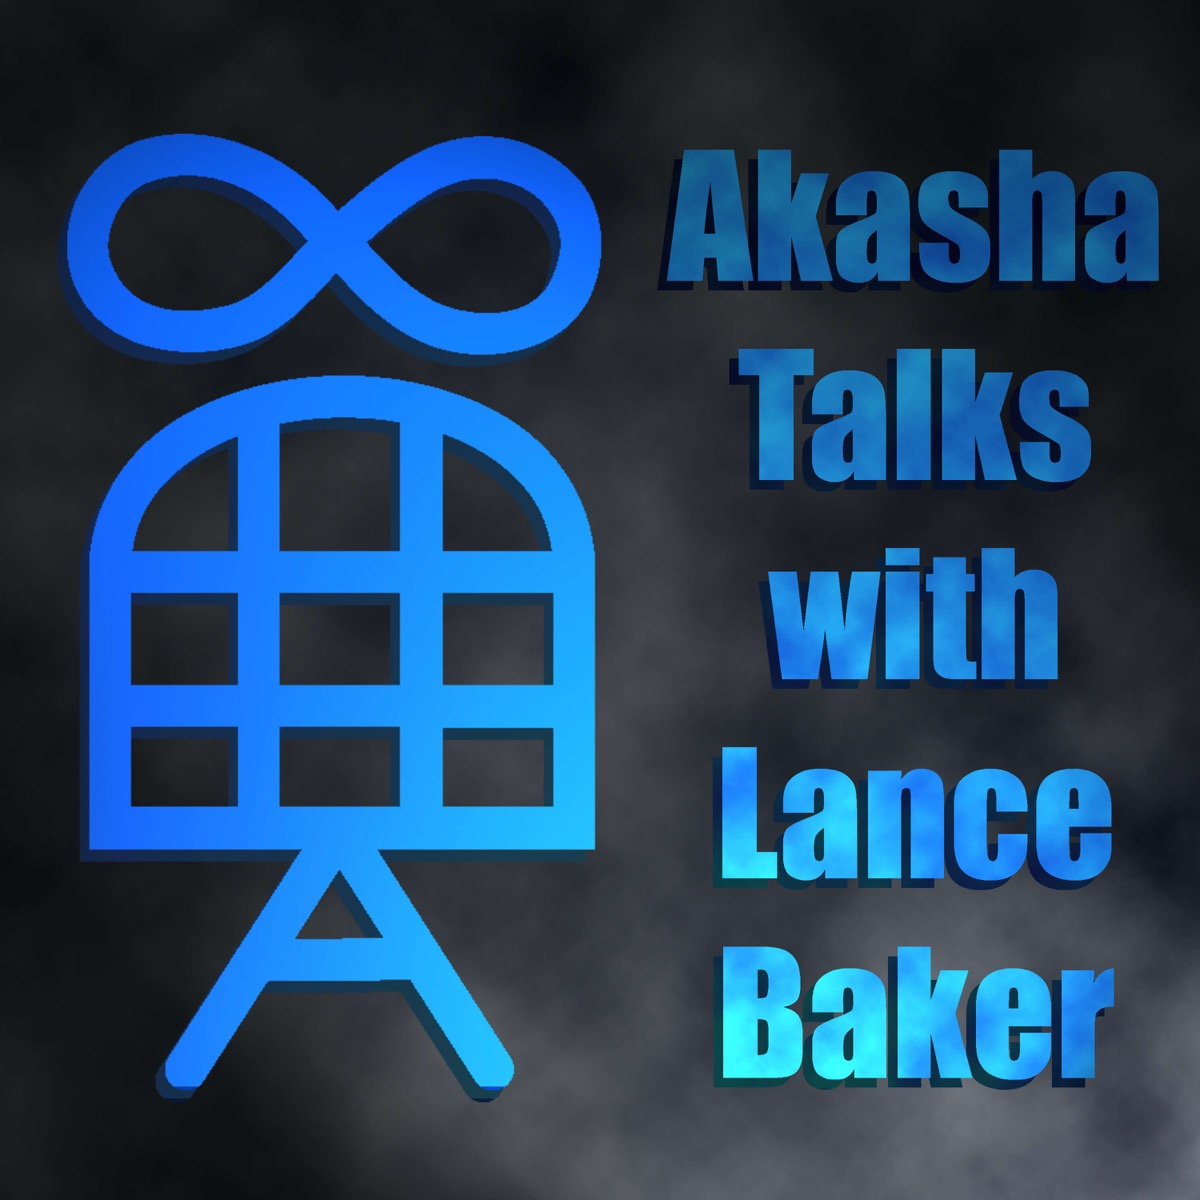 Akasha Talks with Lance Baker | Lyssna här | Poddtoppen.se